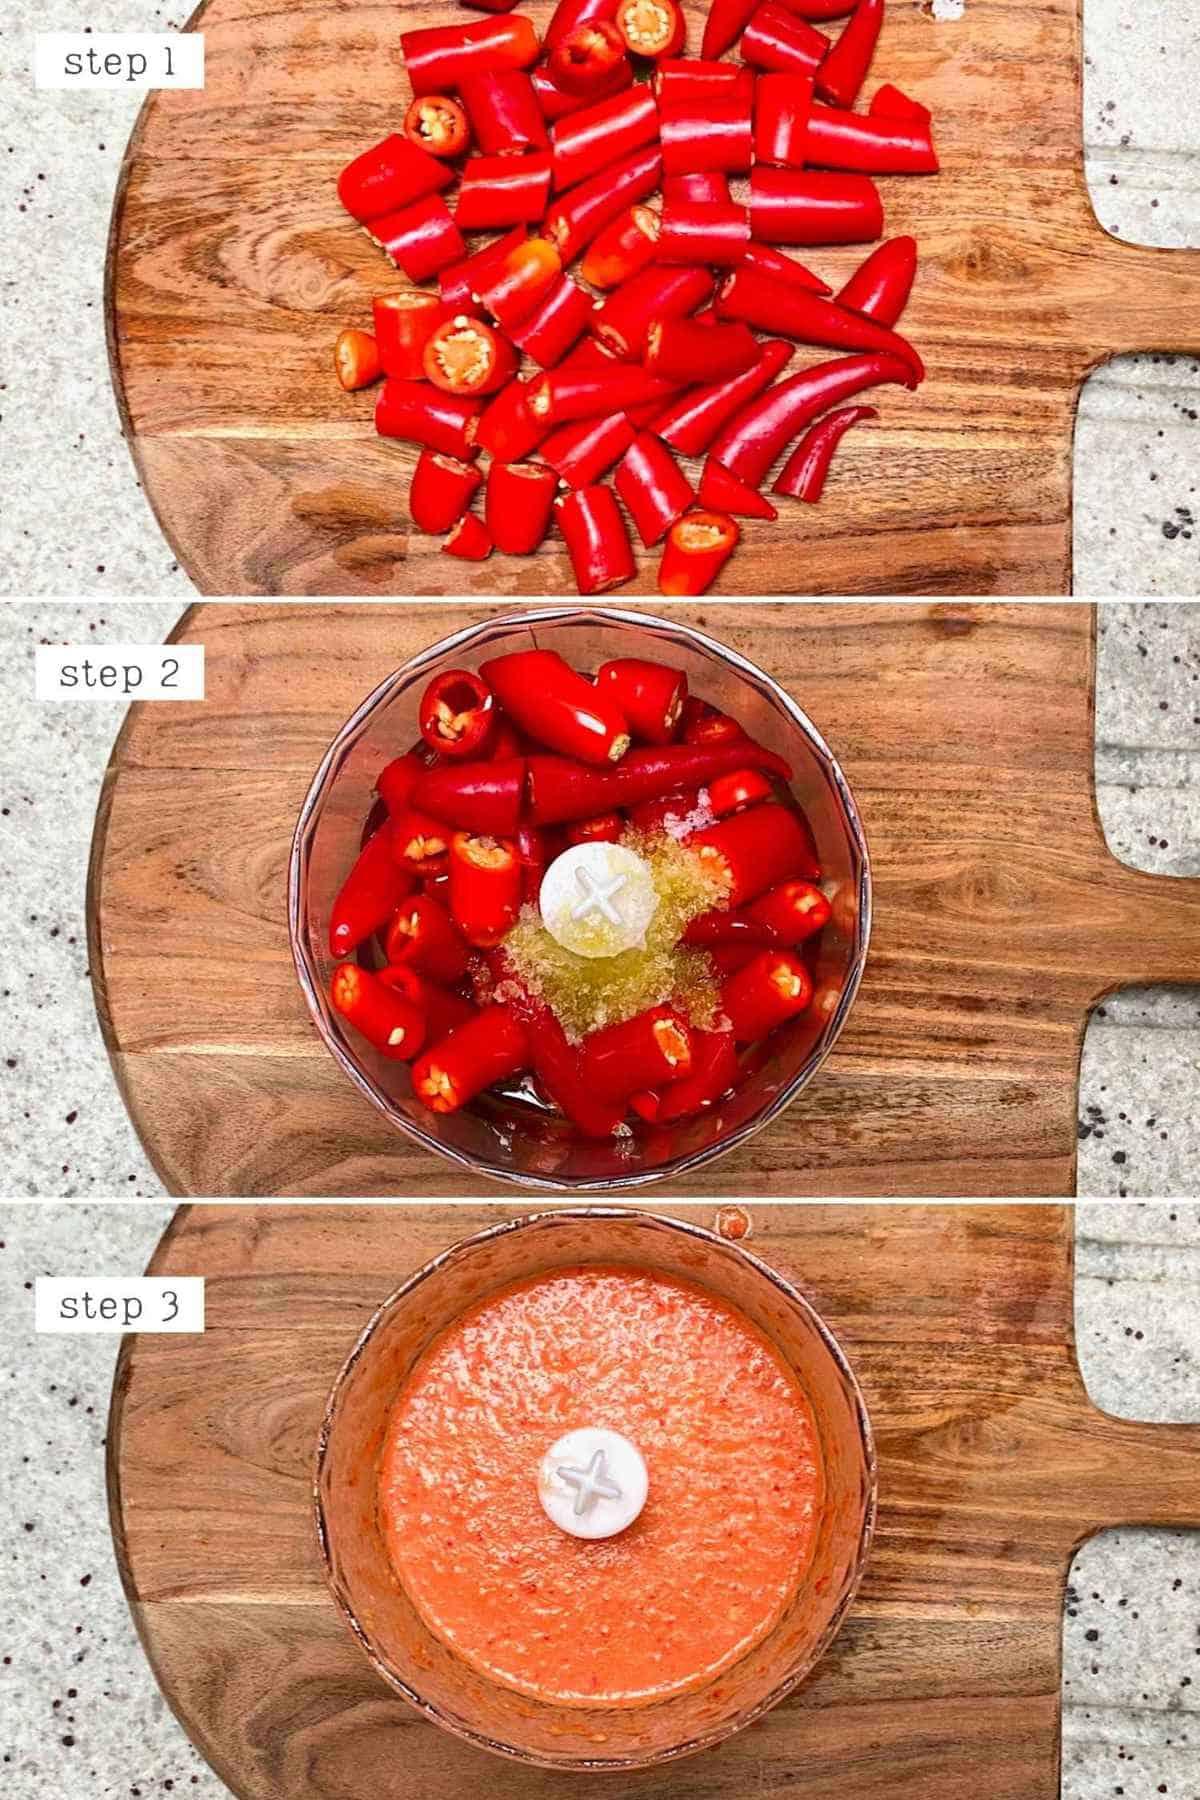 Steps for making homemade chili sauce in a blender